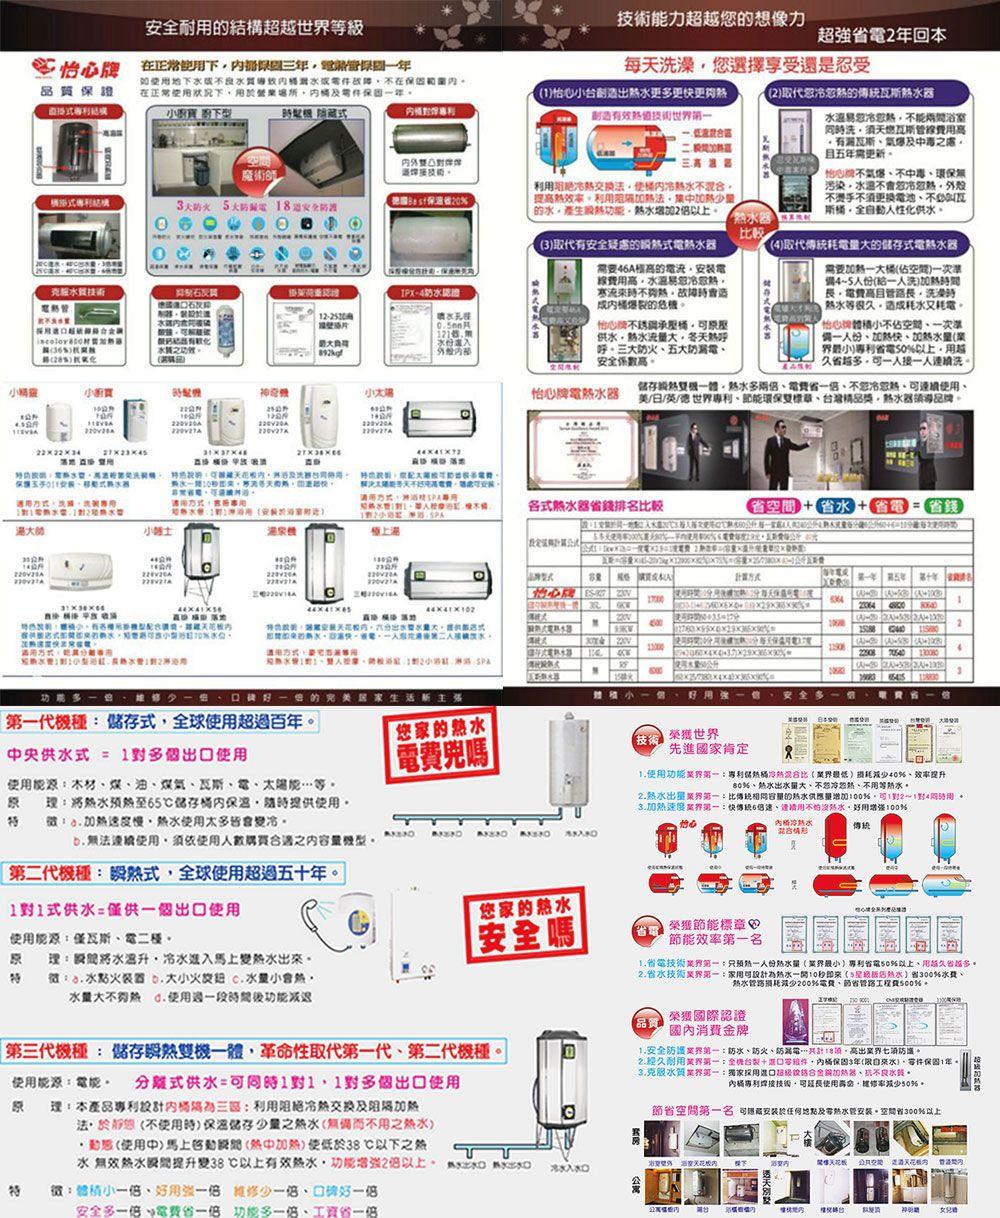 PK/goods/ESING/ES-DM-1.jpg